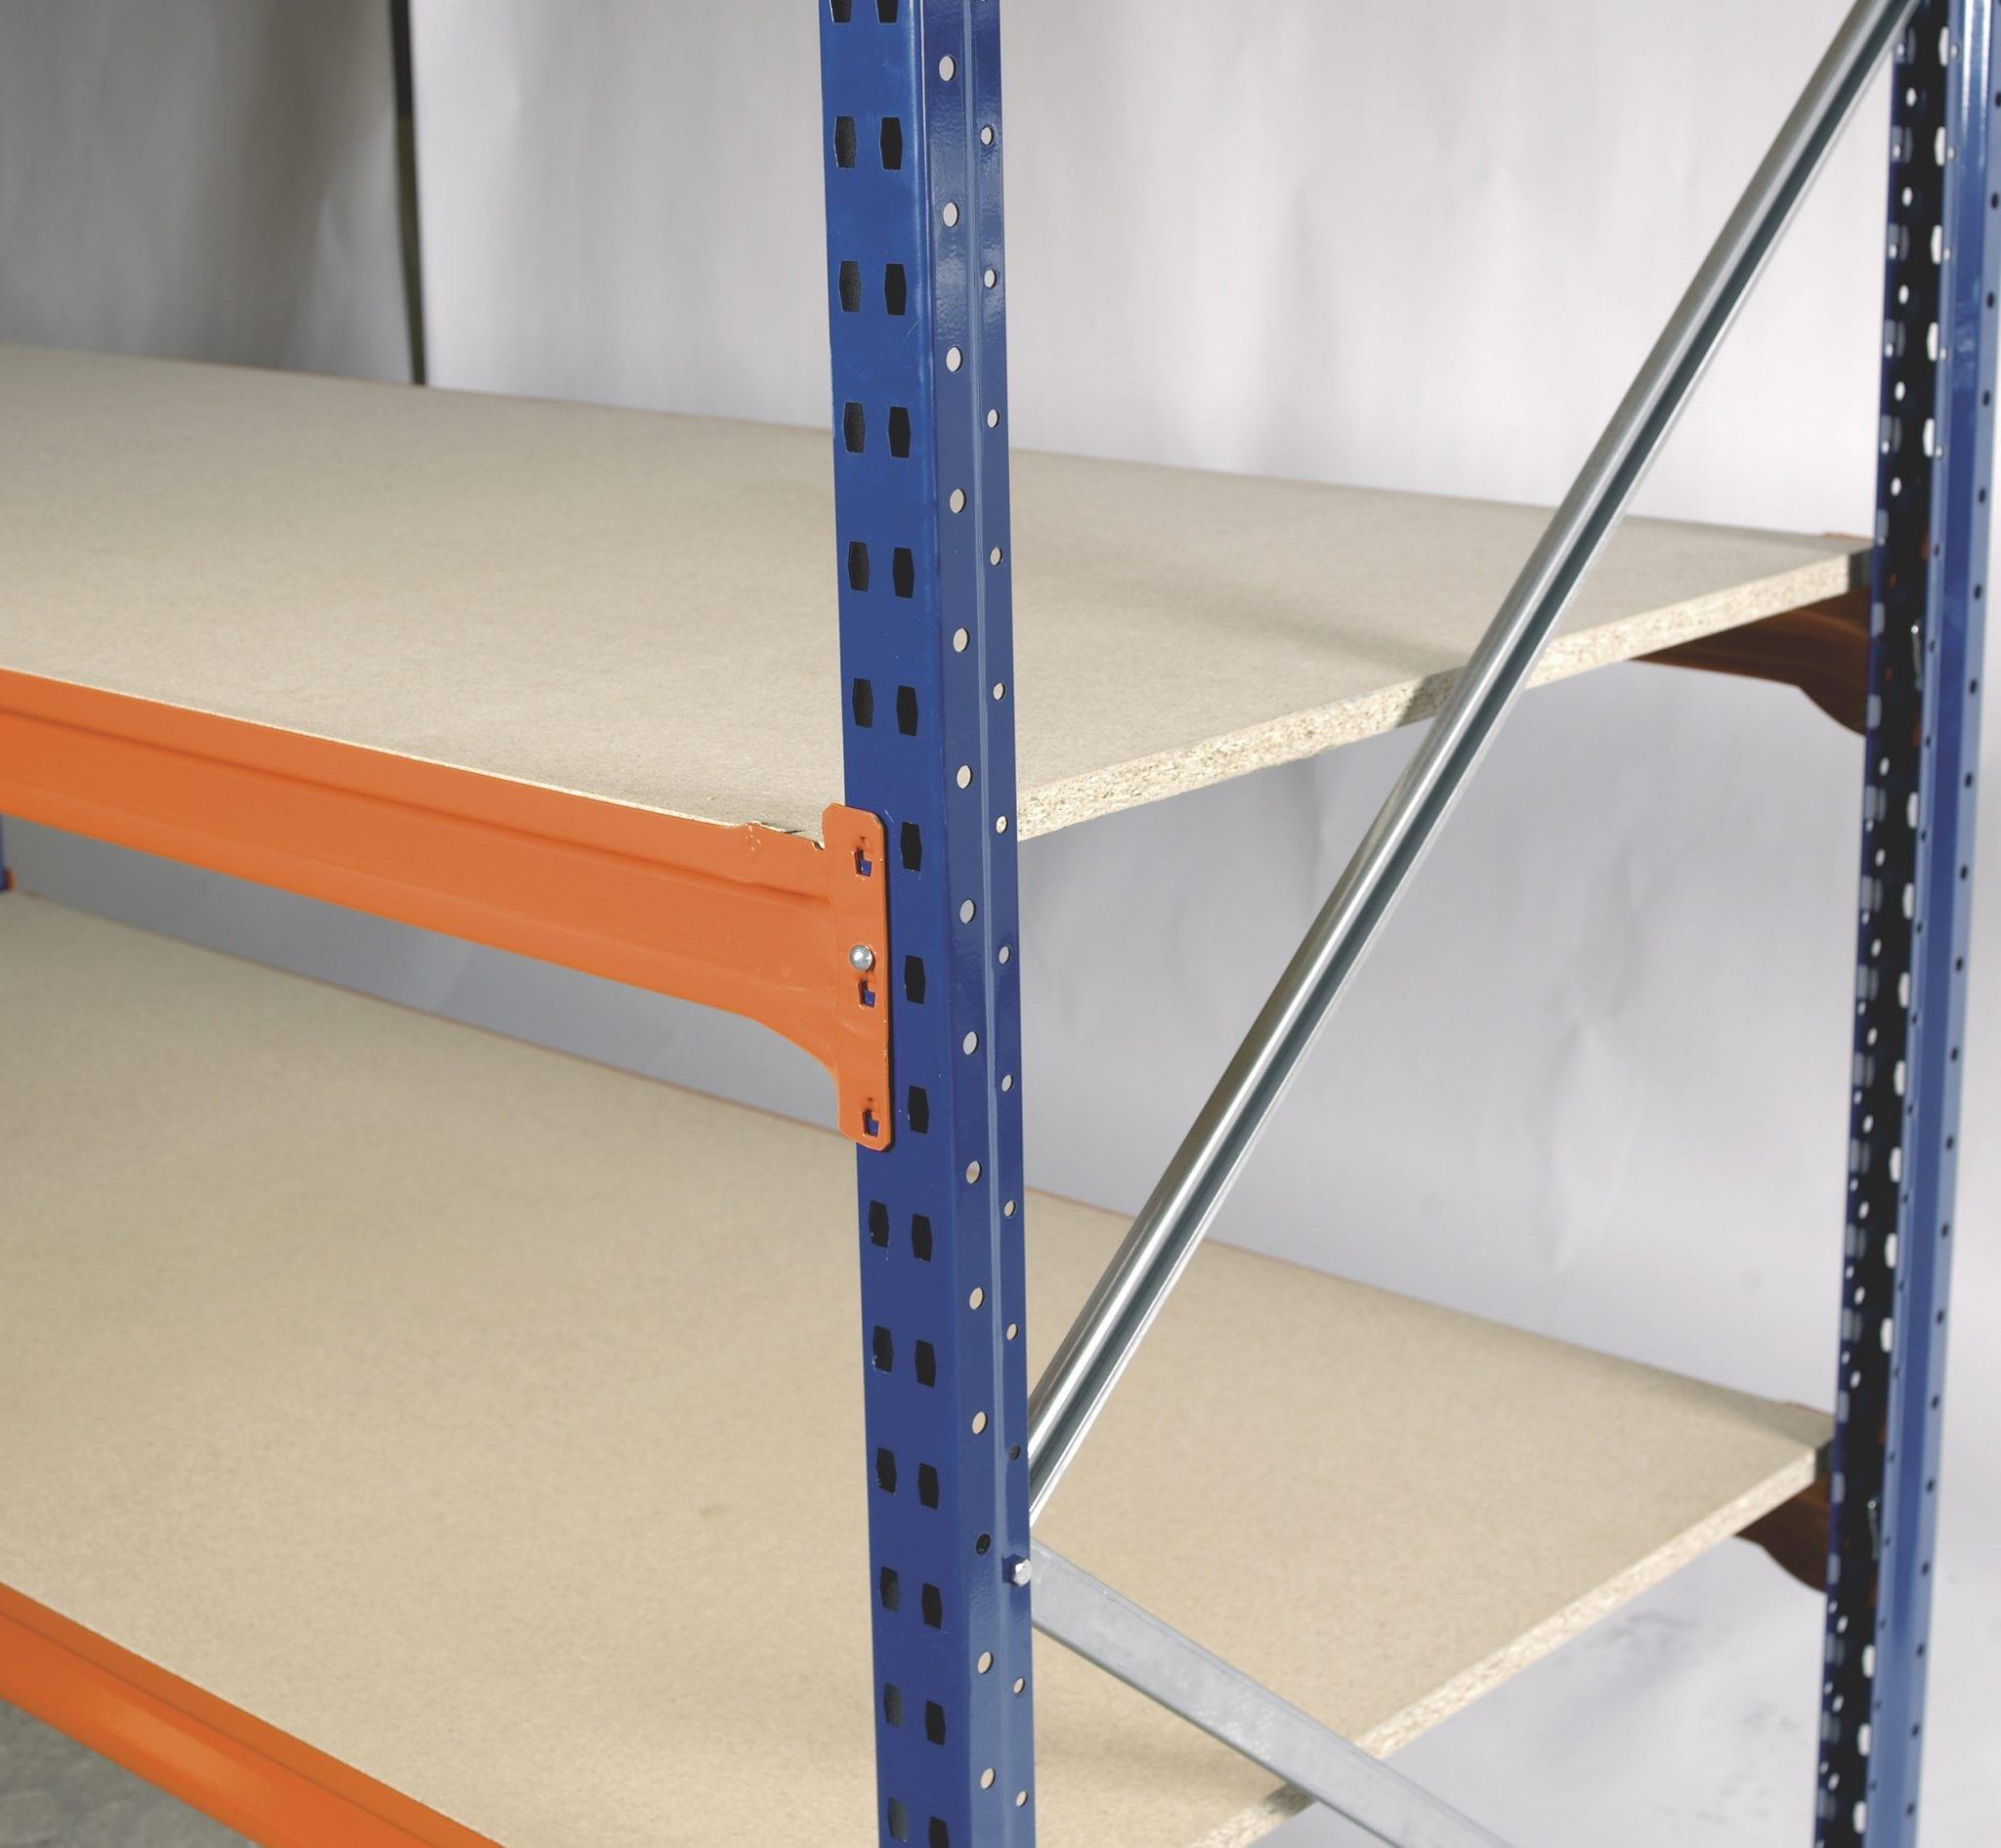 Longspan Shelving Dexion Longspan Shelving Storage Systems